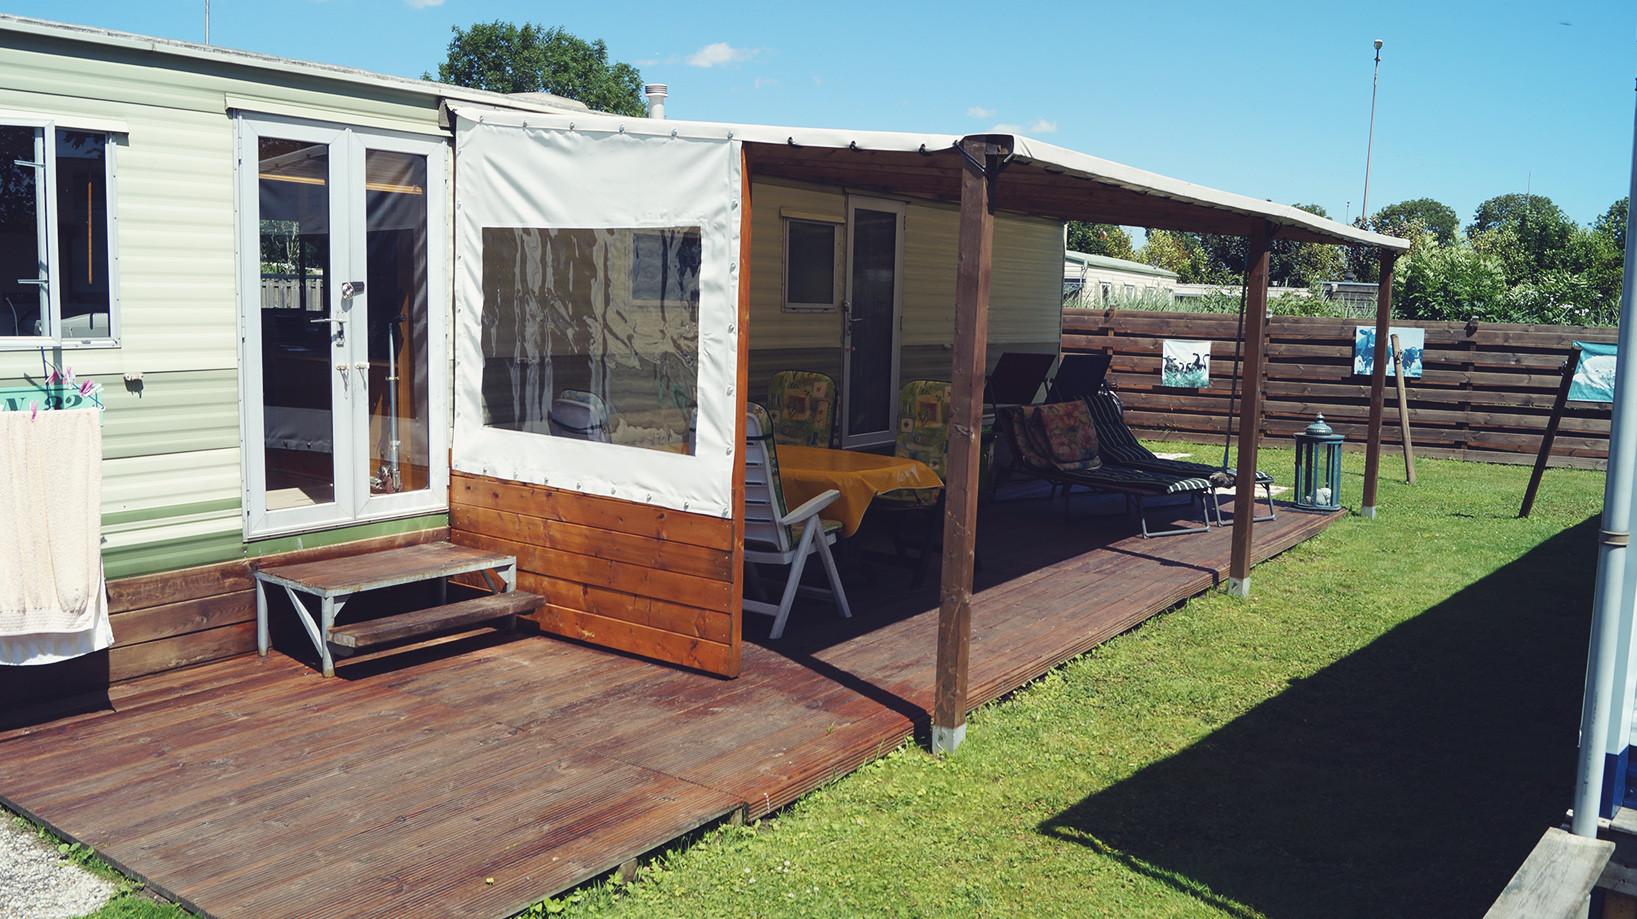 mobilheim nunspeet ferienhaus nunspeet wohnmobil. Black Bedroom Furniture Sets. Home Design Ideas